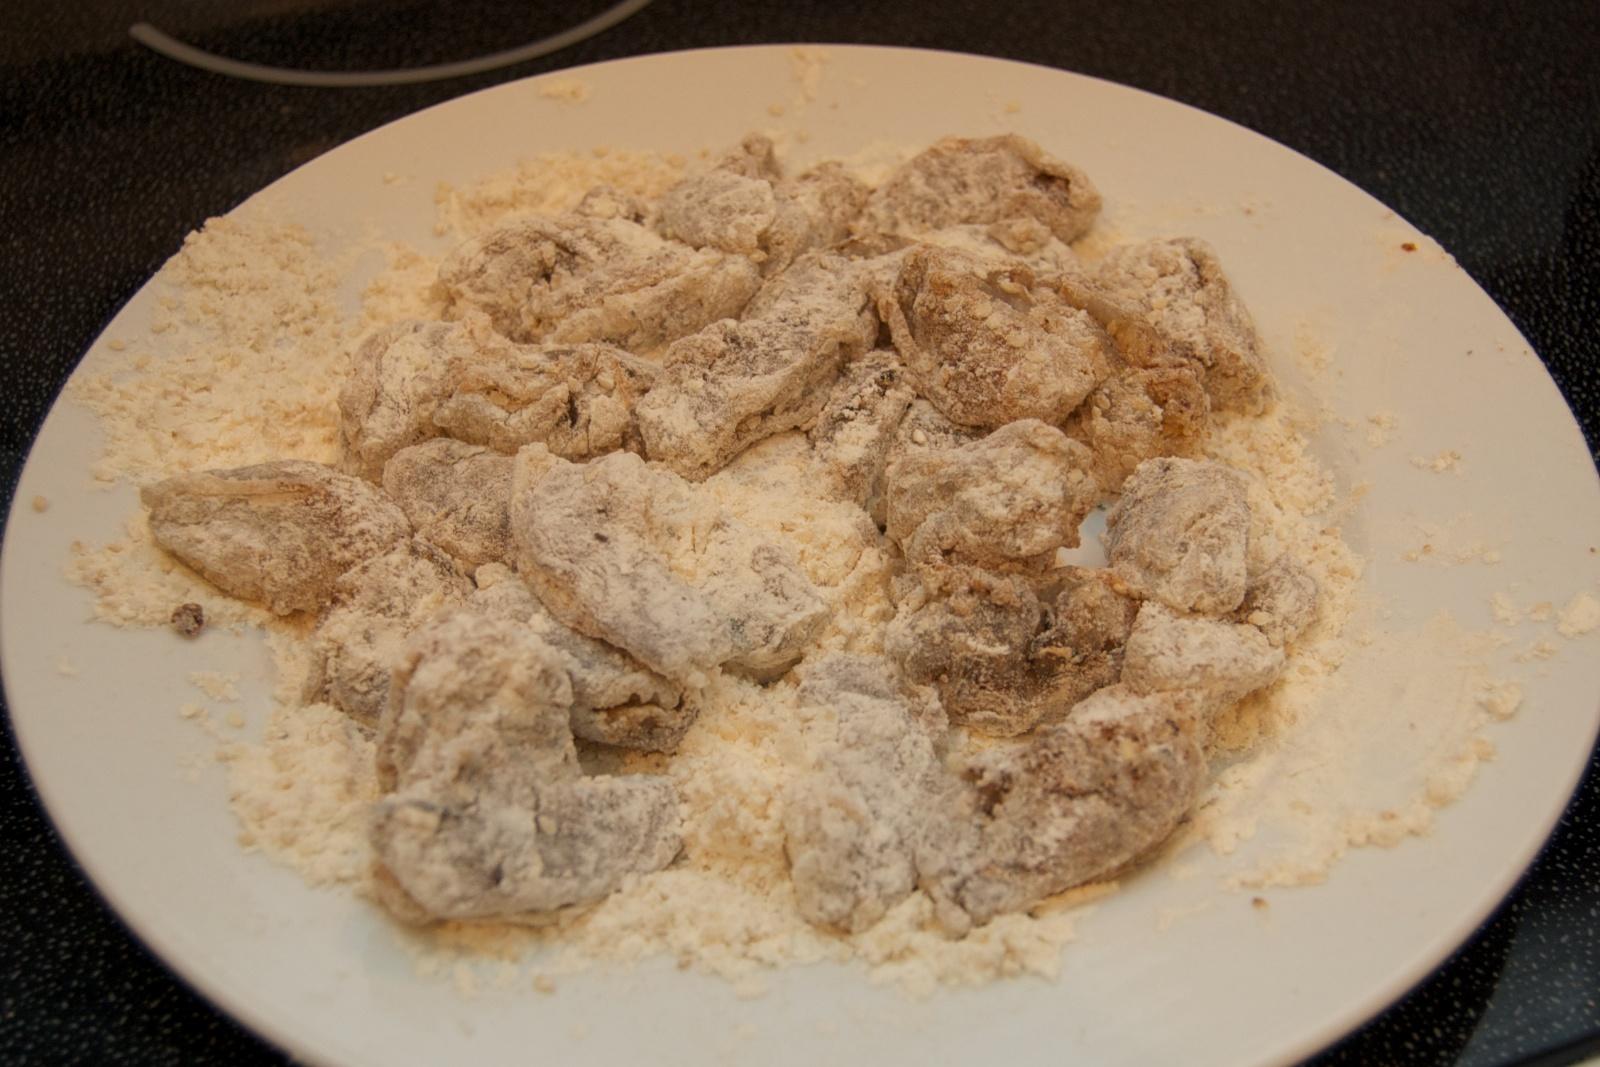 http://blog.rickk.com/food/2010/11/17/szechuanshrimp2.jpg